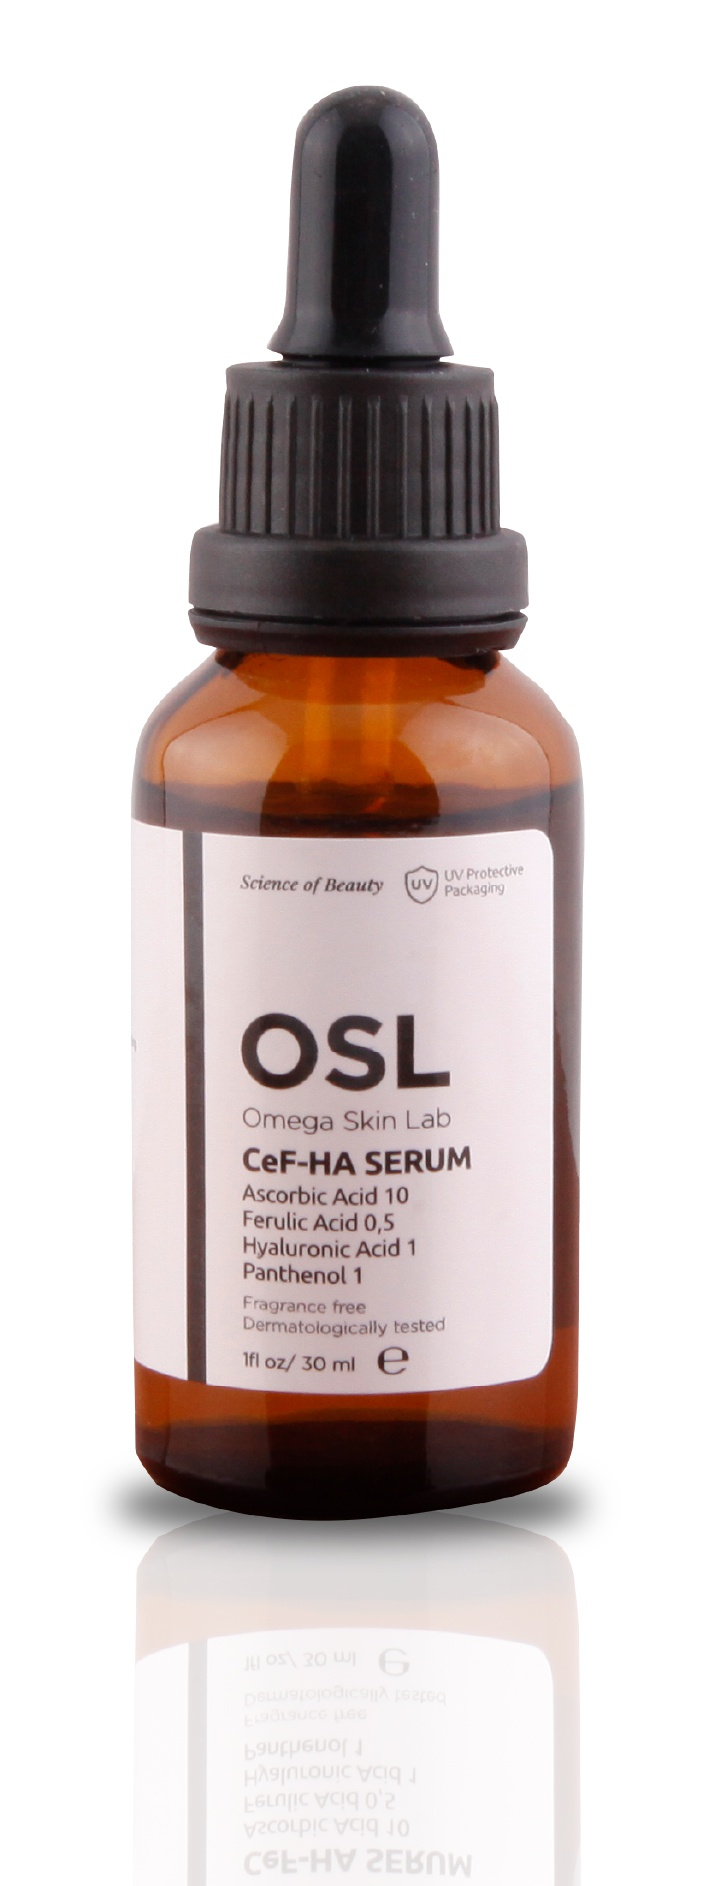 Omega Skin Lab Cef-Ha Serum